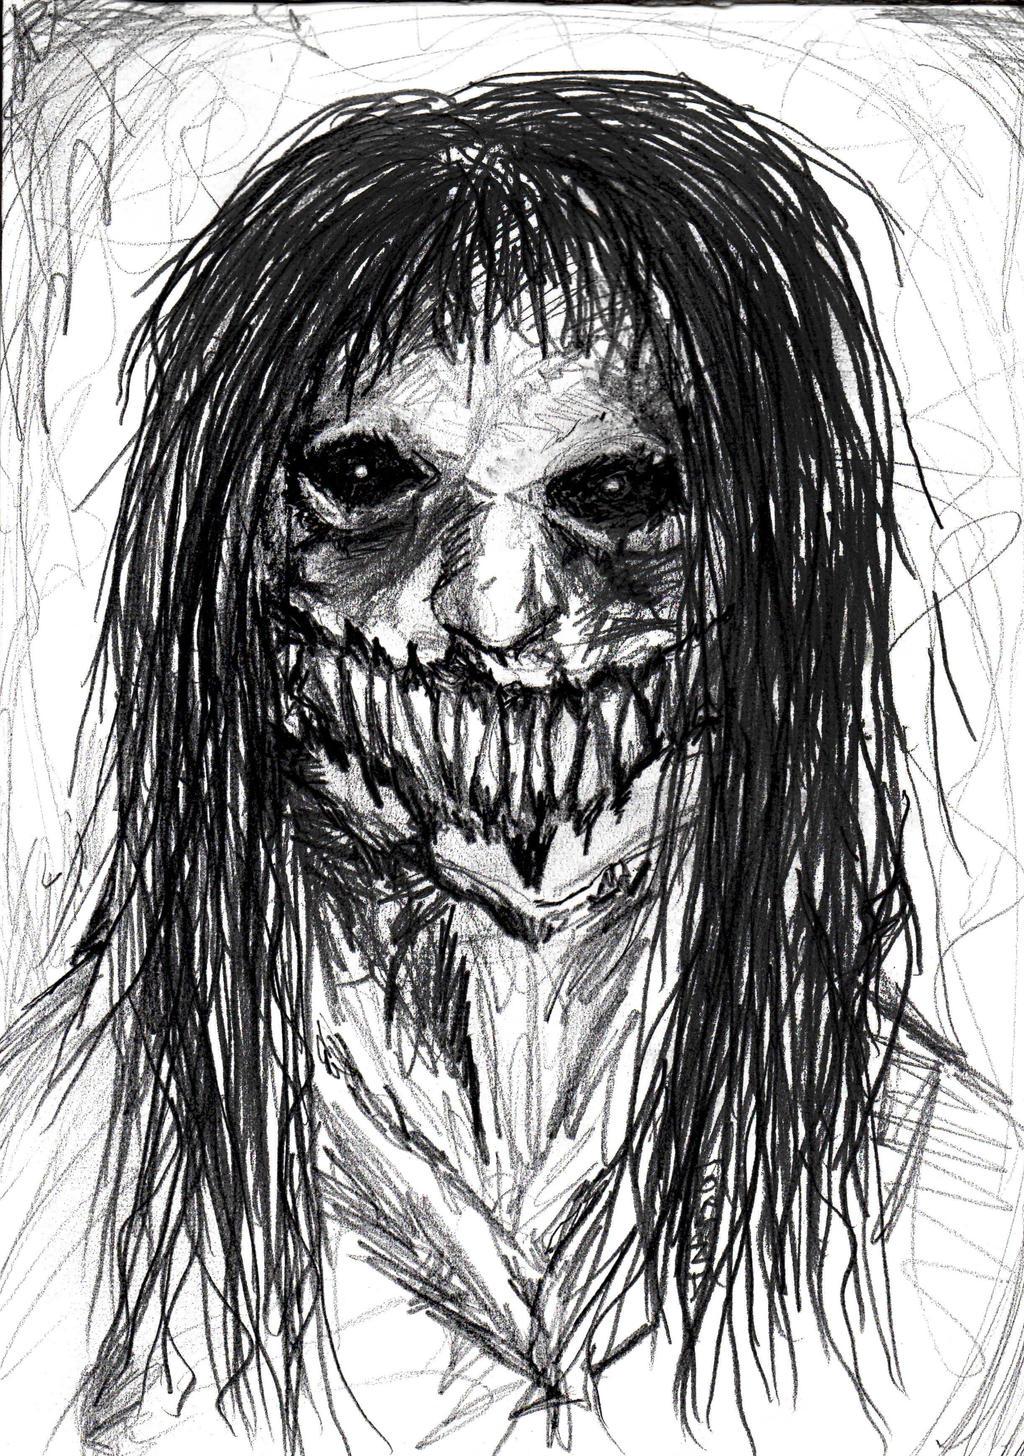 Creepy Face Sketch By CiervoAxis On DeviantArt